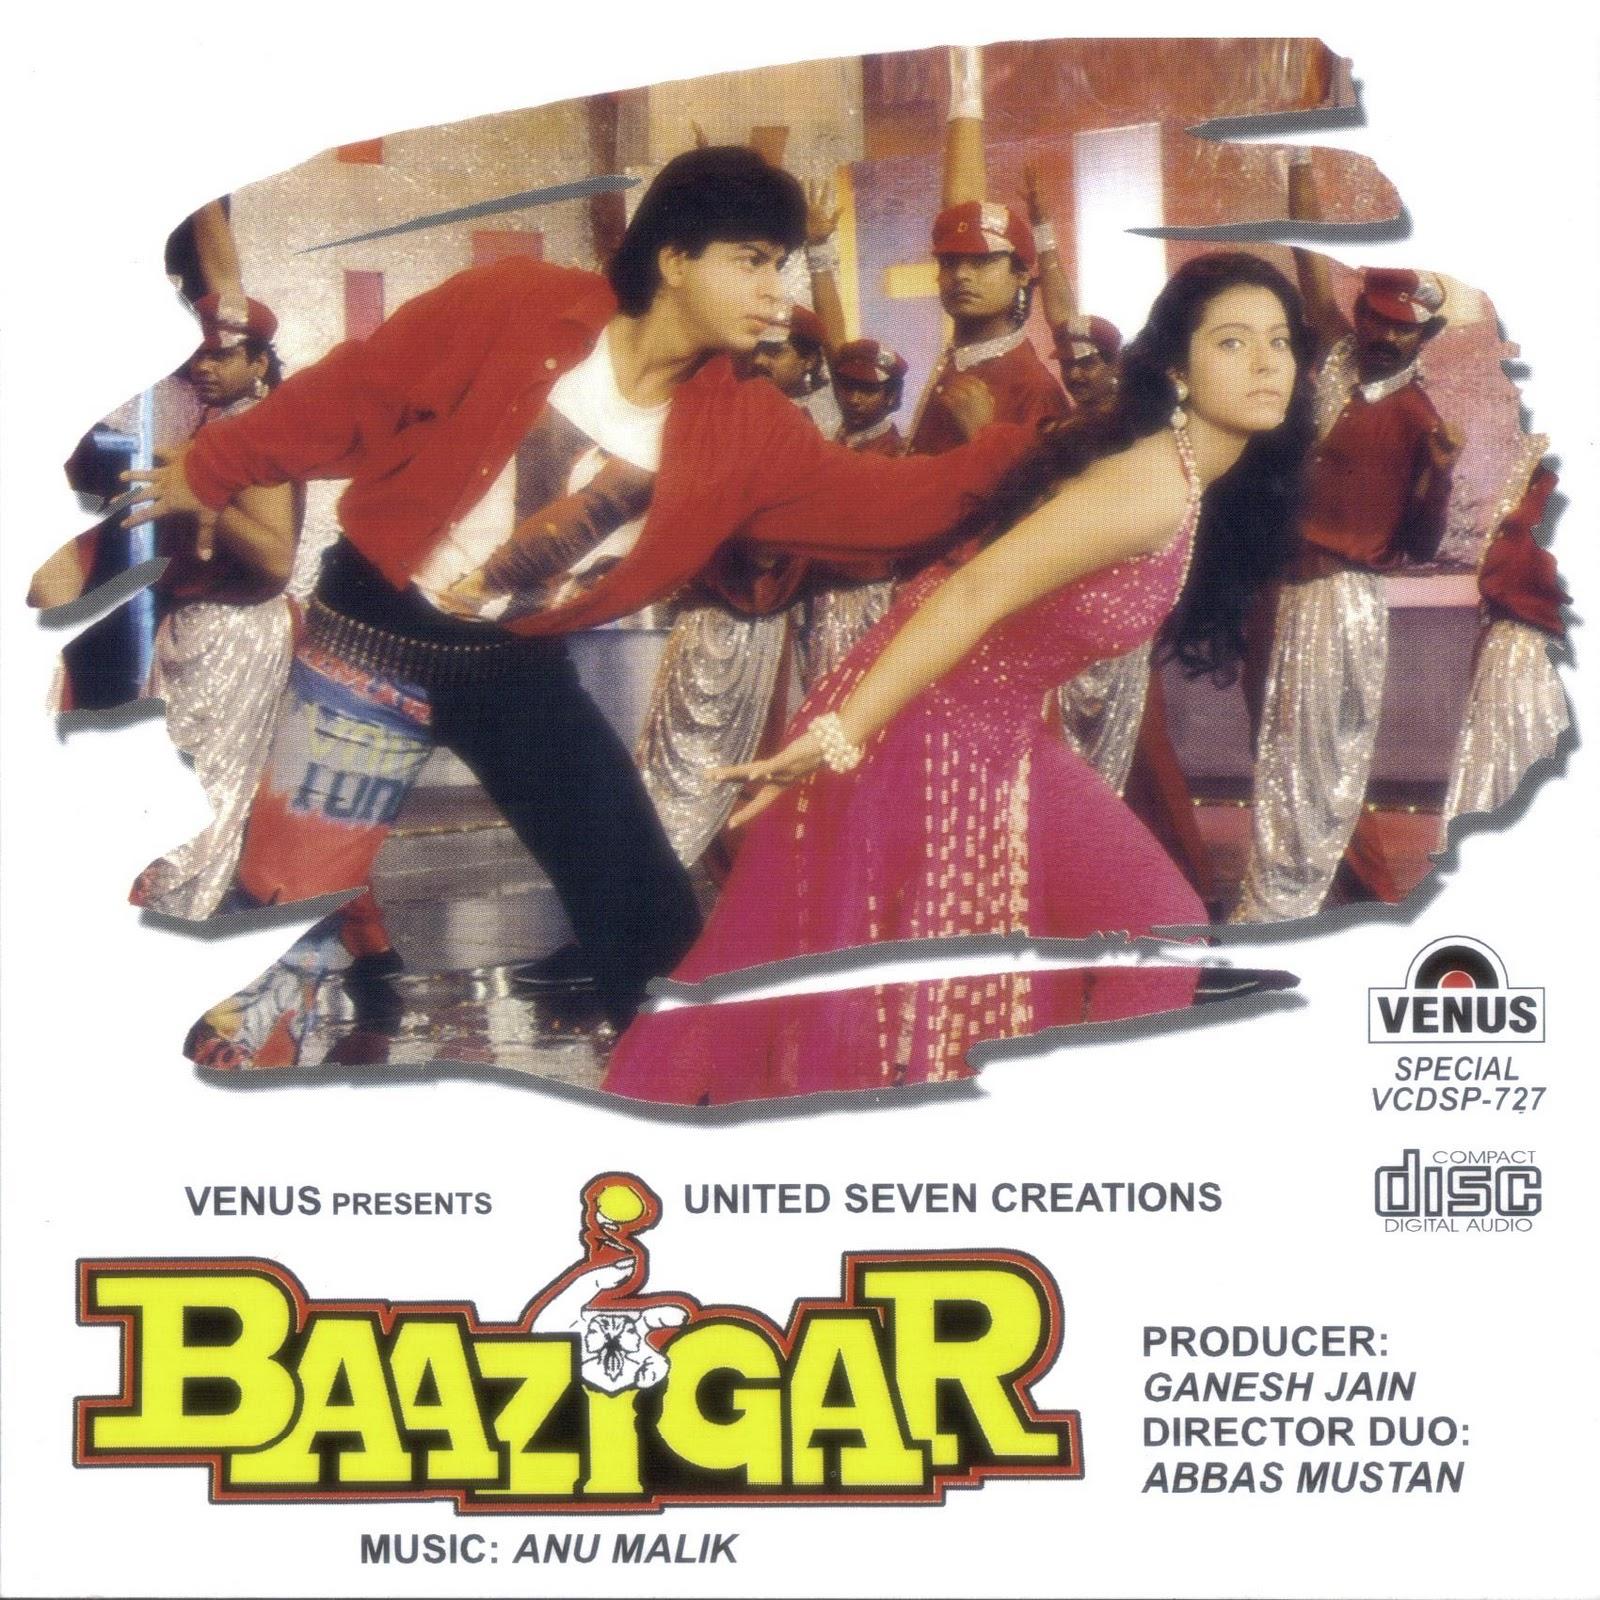 Oo Oh Jaane Jaanaa New Version Mp3 Song: Filmography Of Shahrukh Khan